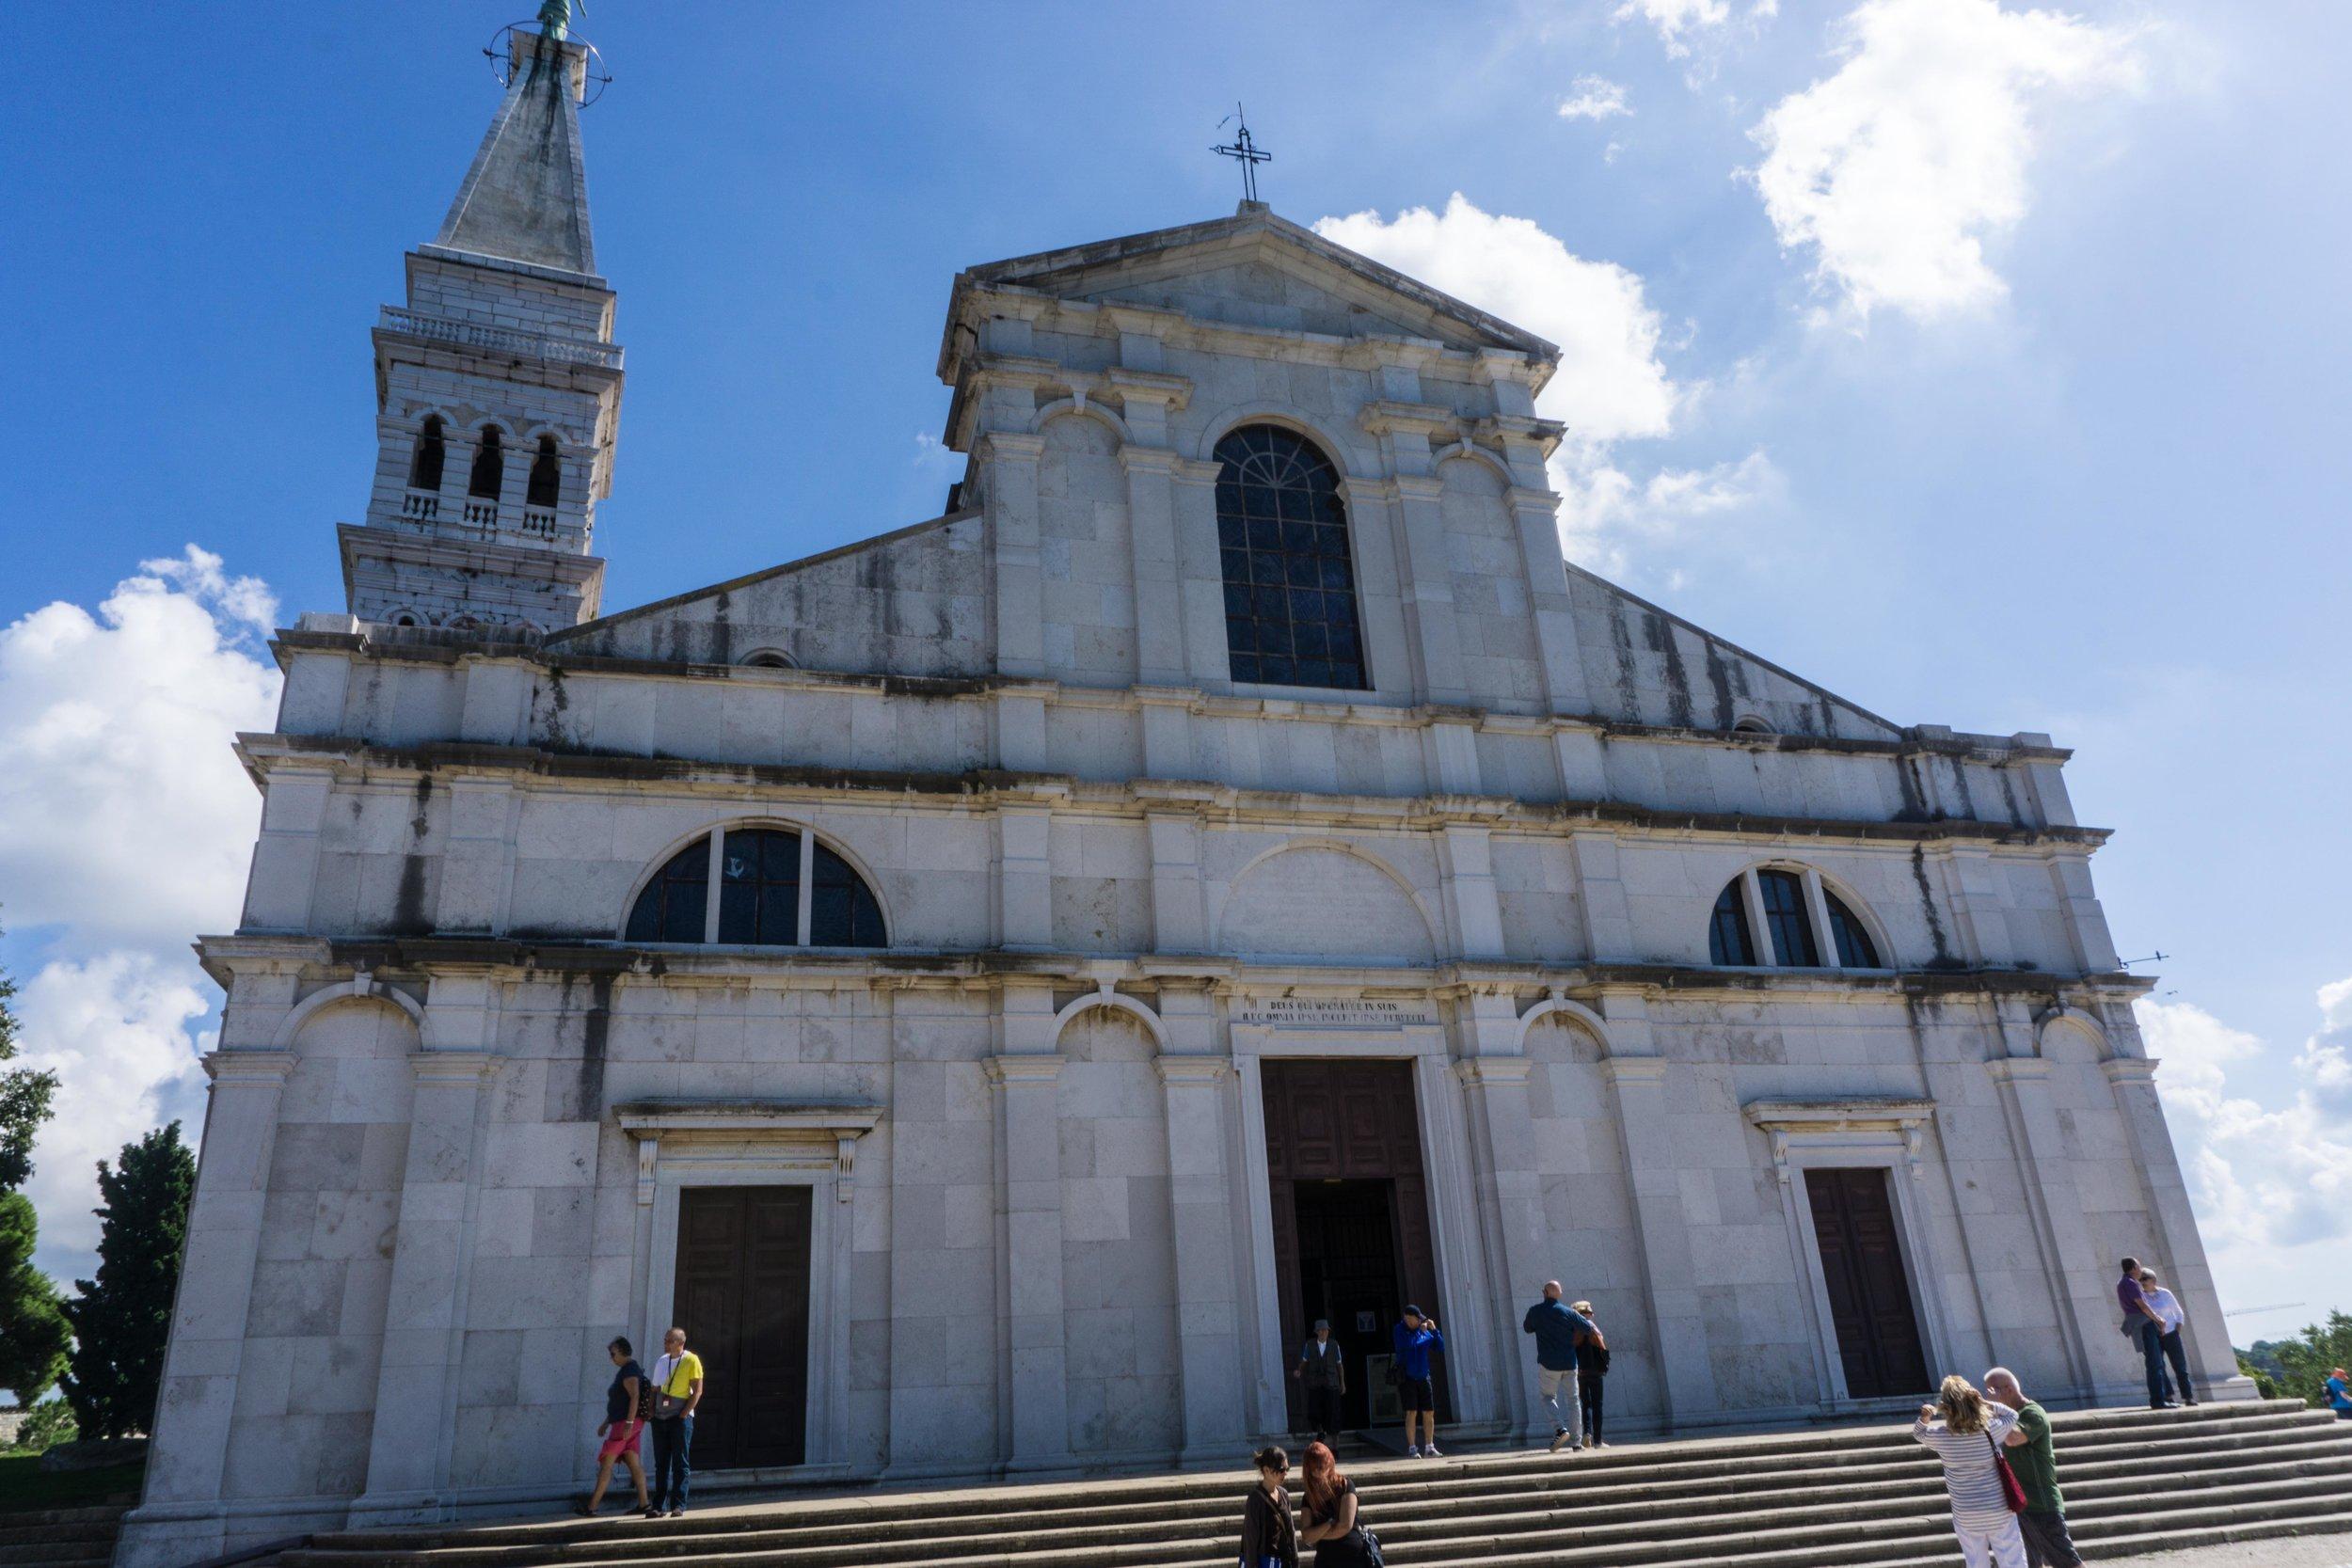 Istria-04069.jpg